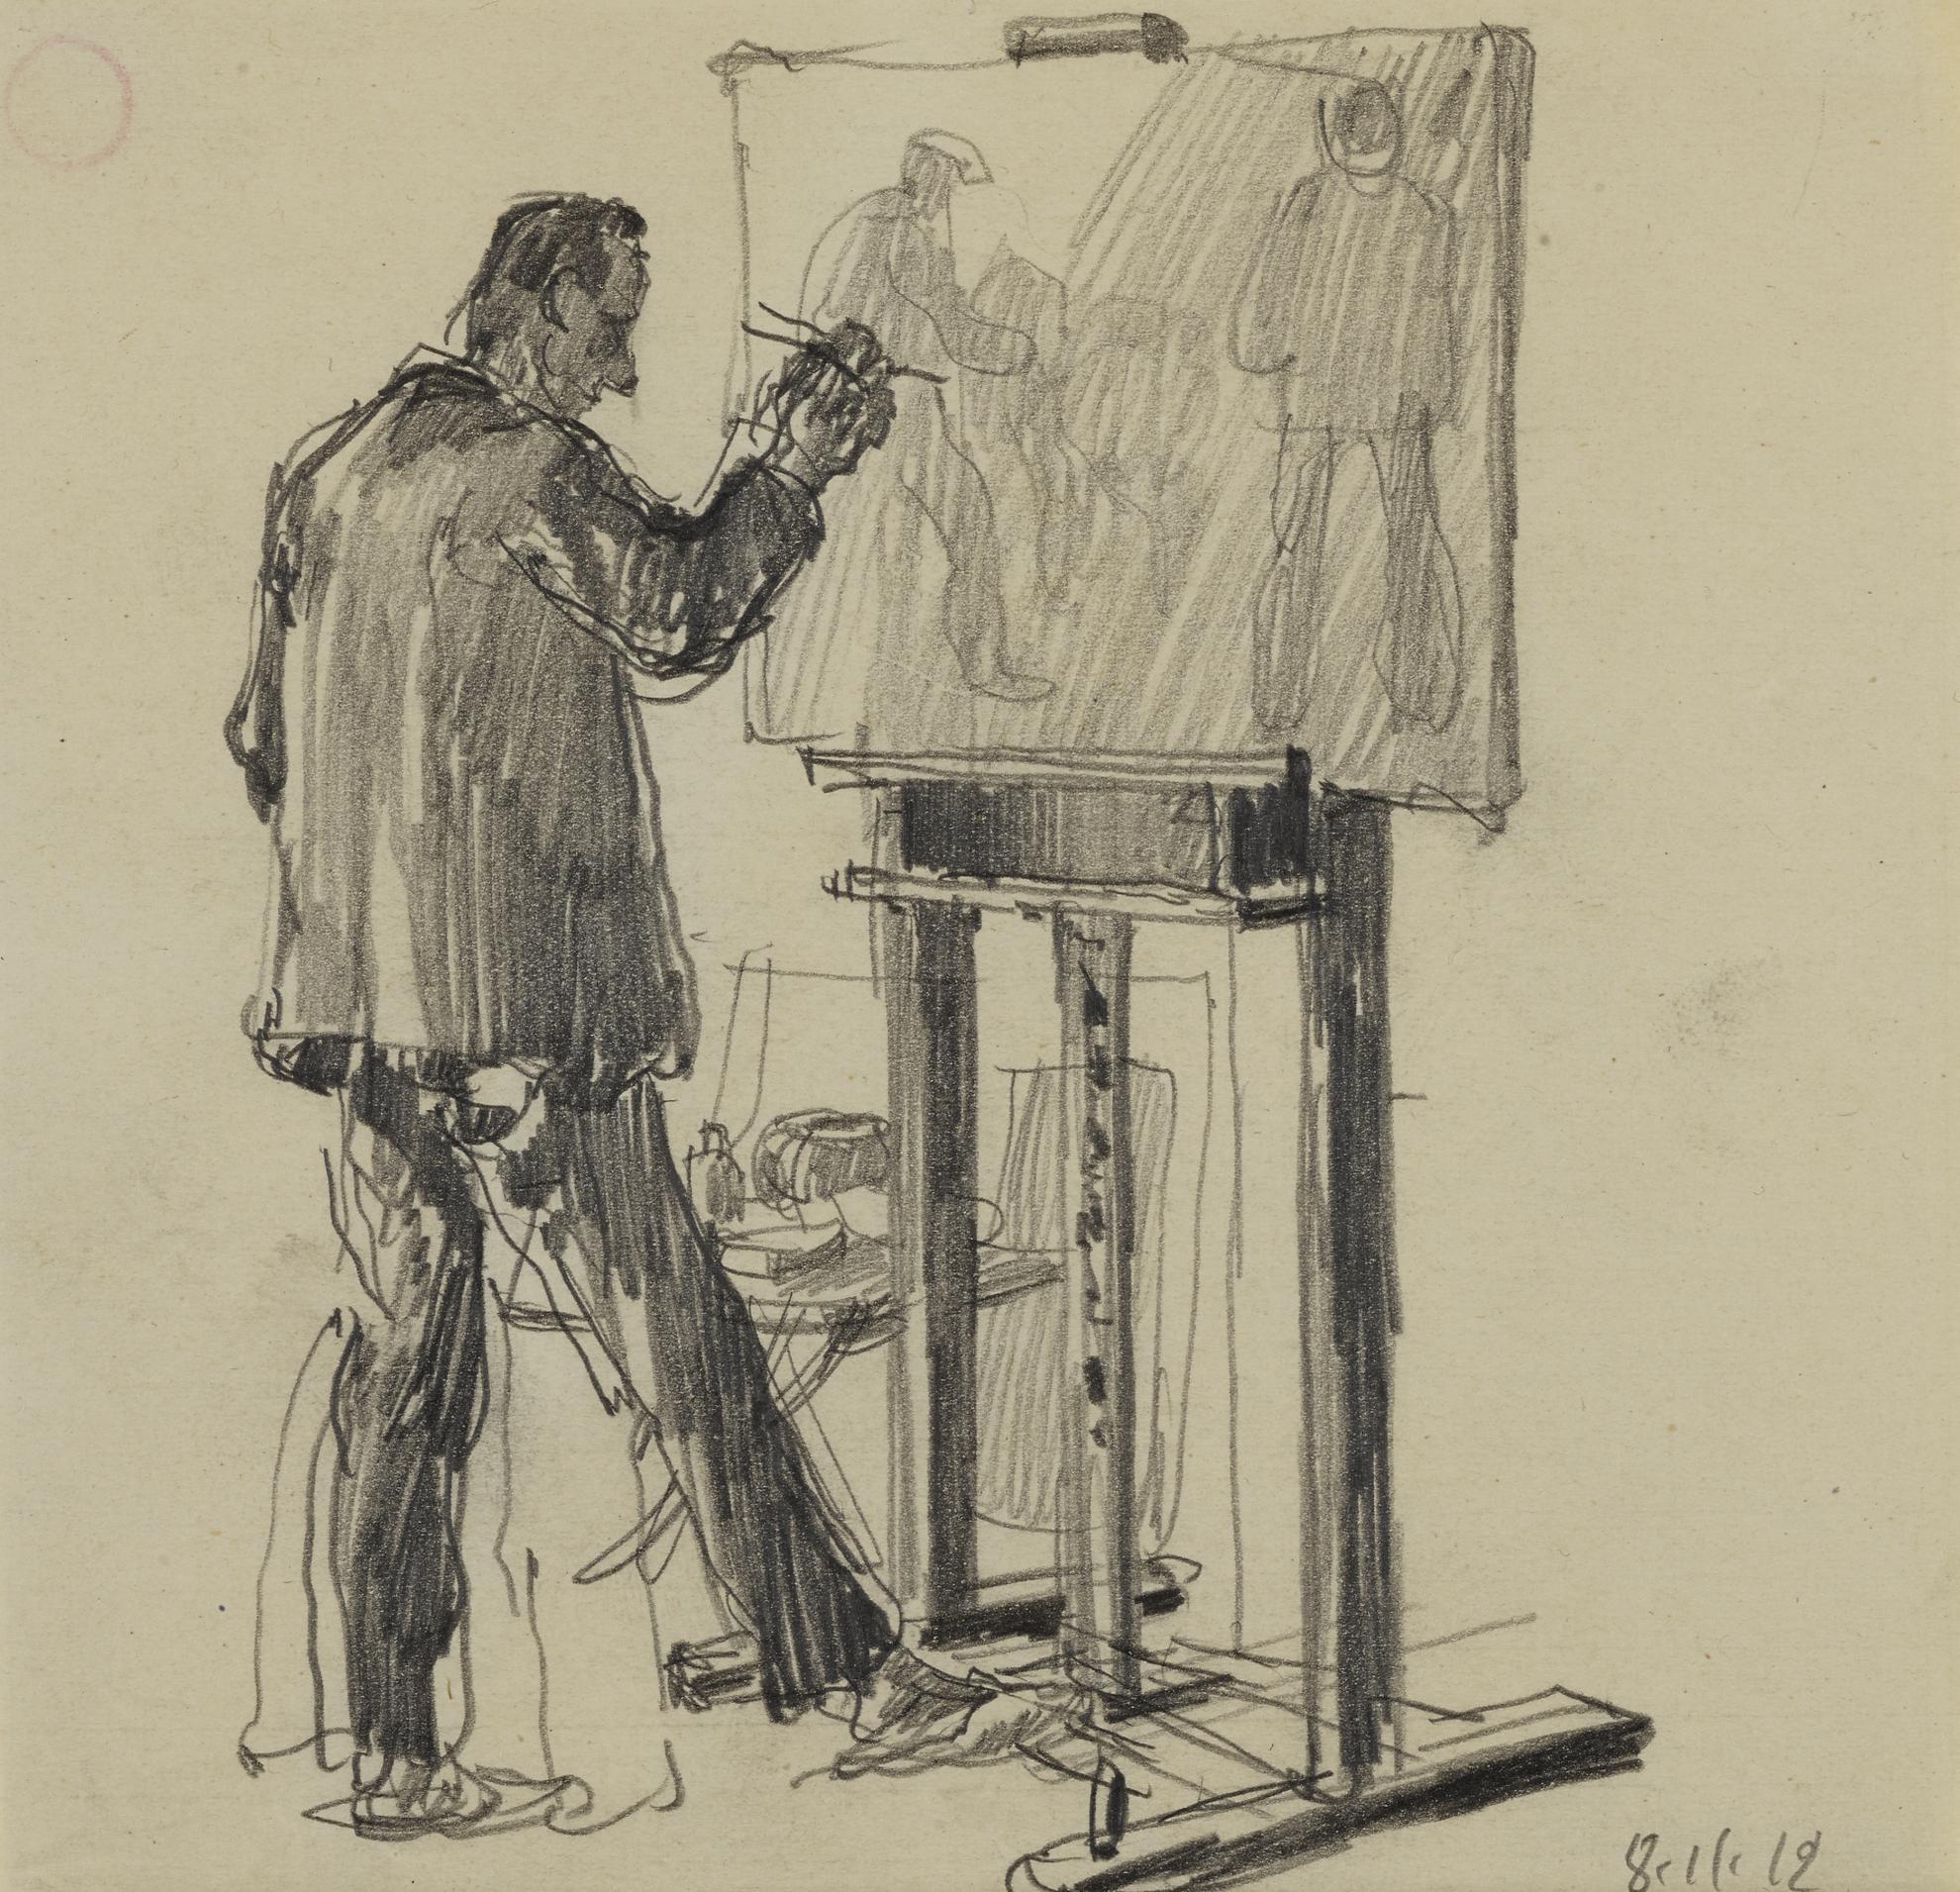 George Grosz-Studio Berlin Sudende-Herbert Fiedler An Der Staffelei (Studio Berlin Sudende—Herbert Fiedler At The Easel)-1912